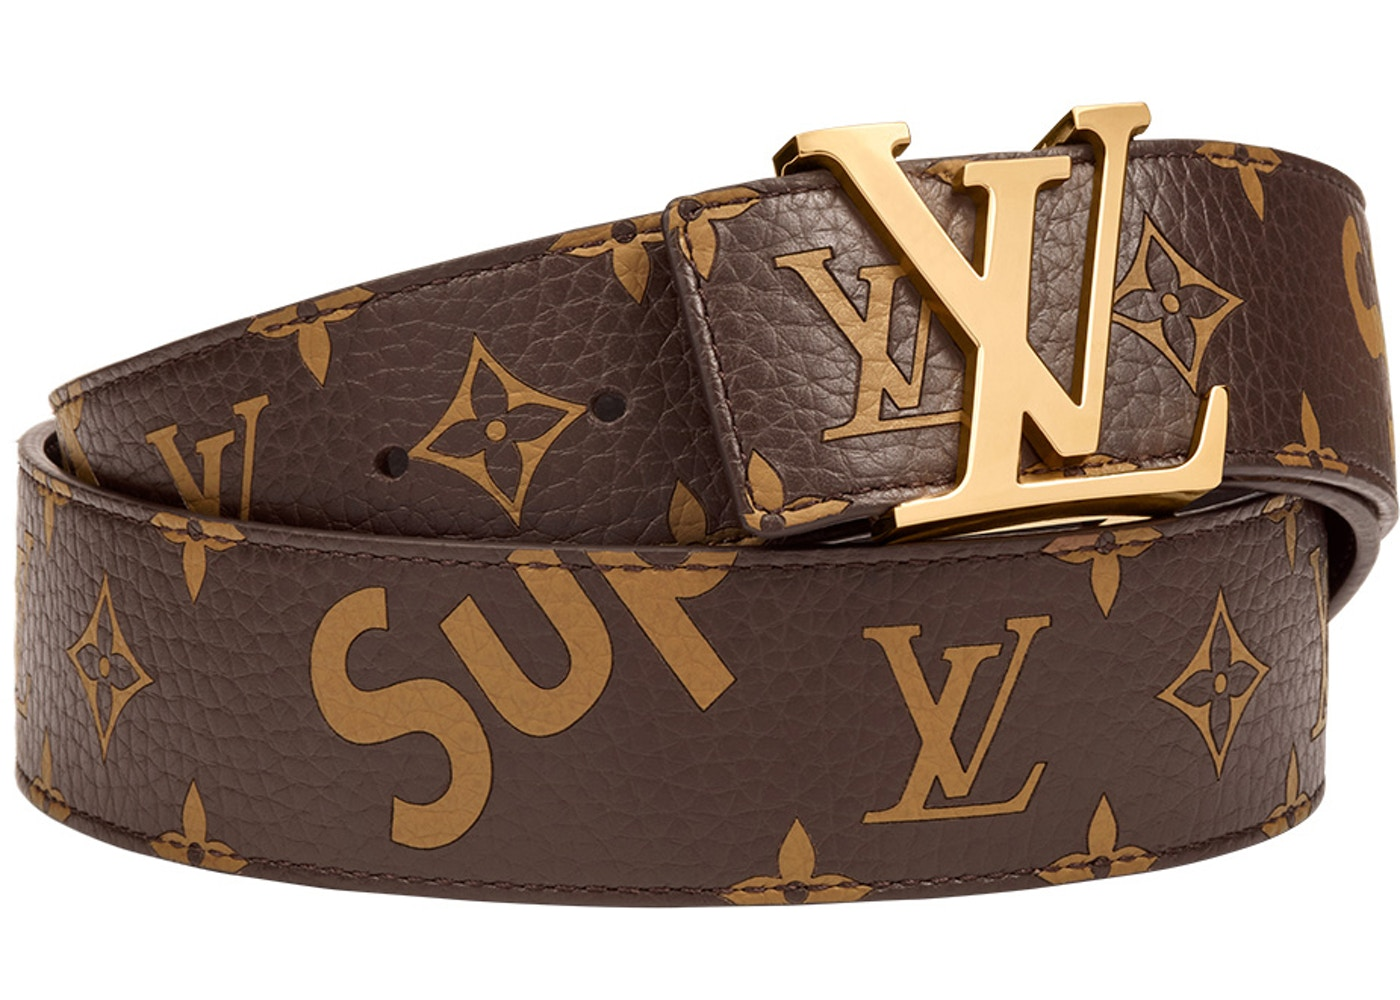 selezione migliore b9cee ed2a9 Louis Vuitton x Supreme Initiales Belt 40 MM Monogram Brown Gold